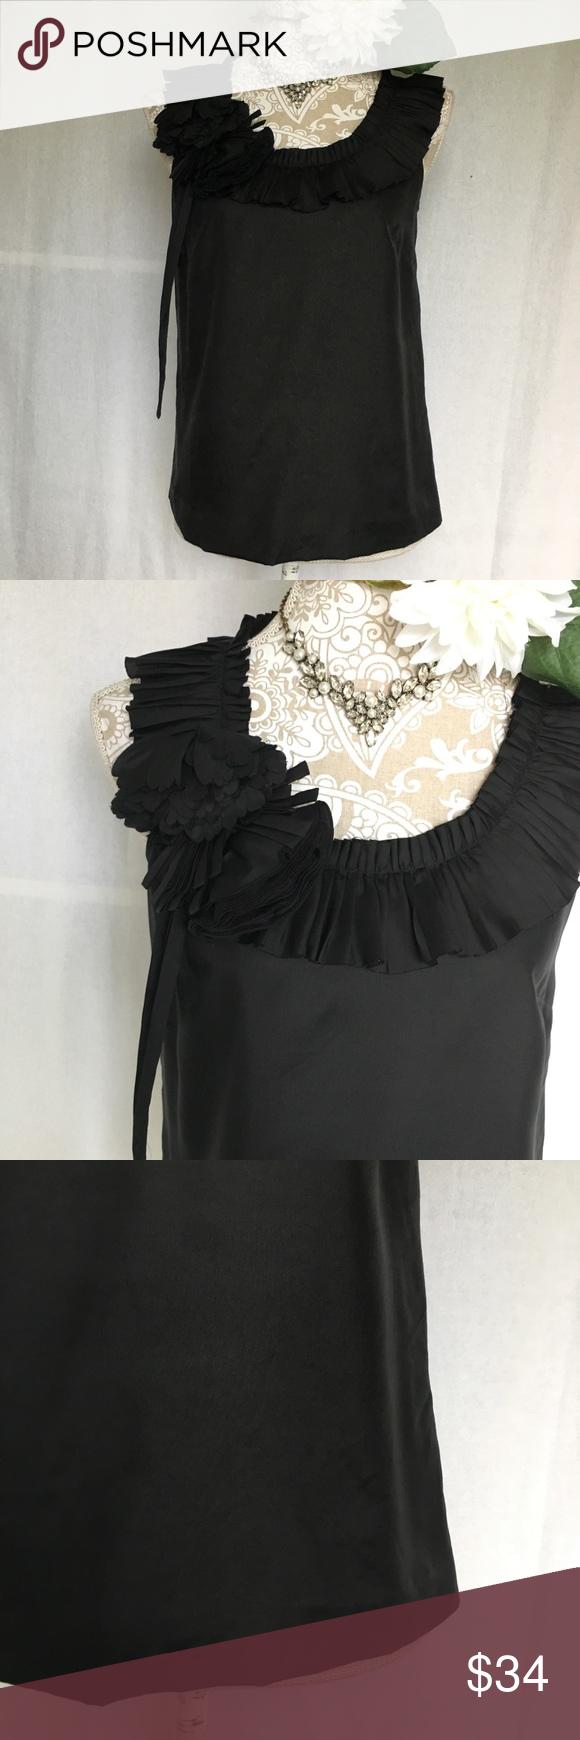 d6dce25b5820 J. Crew // Black Silk Pleated Posy Top SZ 0 18679 A gorgeous silk top from J.  Crew. Black color. Pleats and fabric flowers along the neckline.